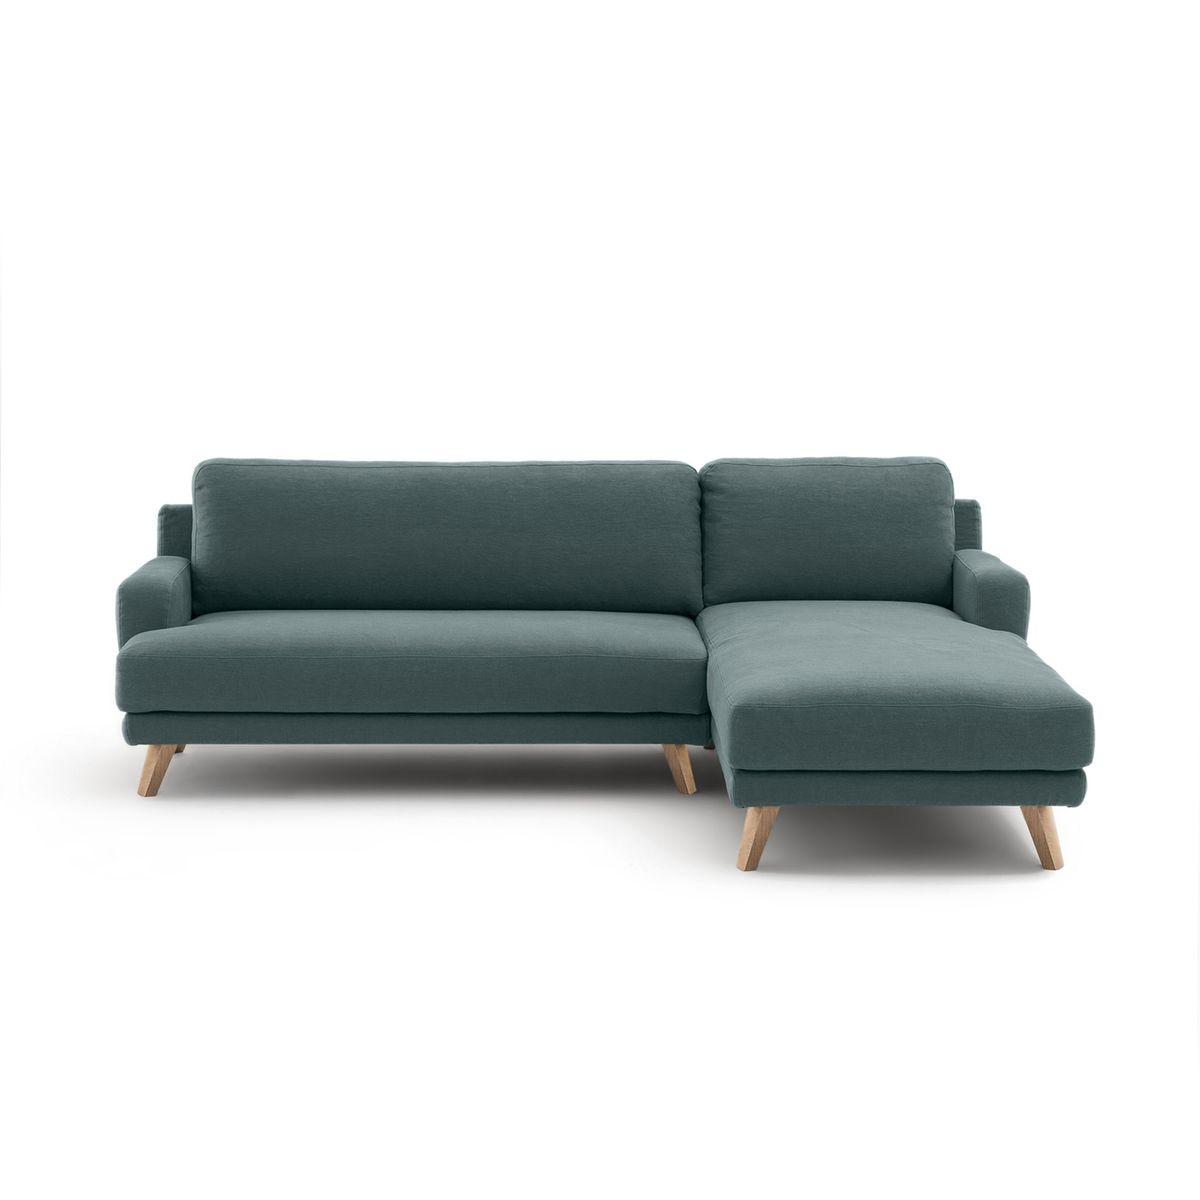 Canapé d'angle Tissu Design Confort